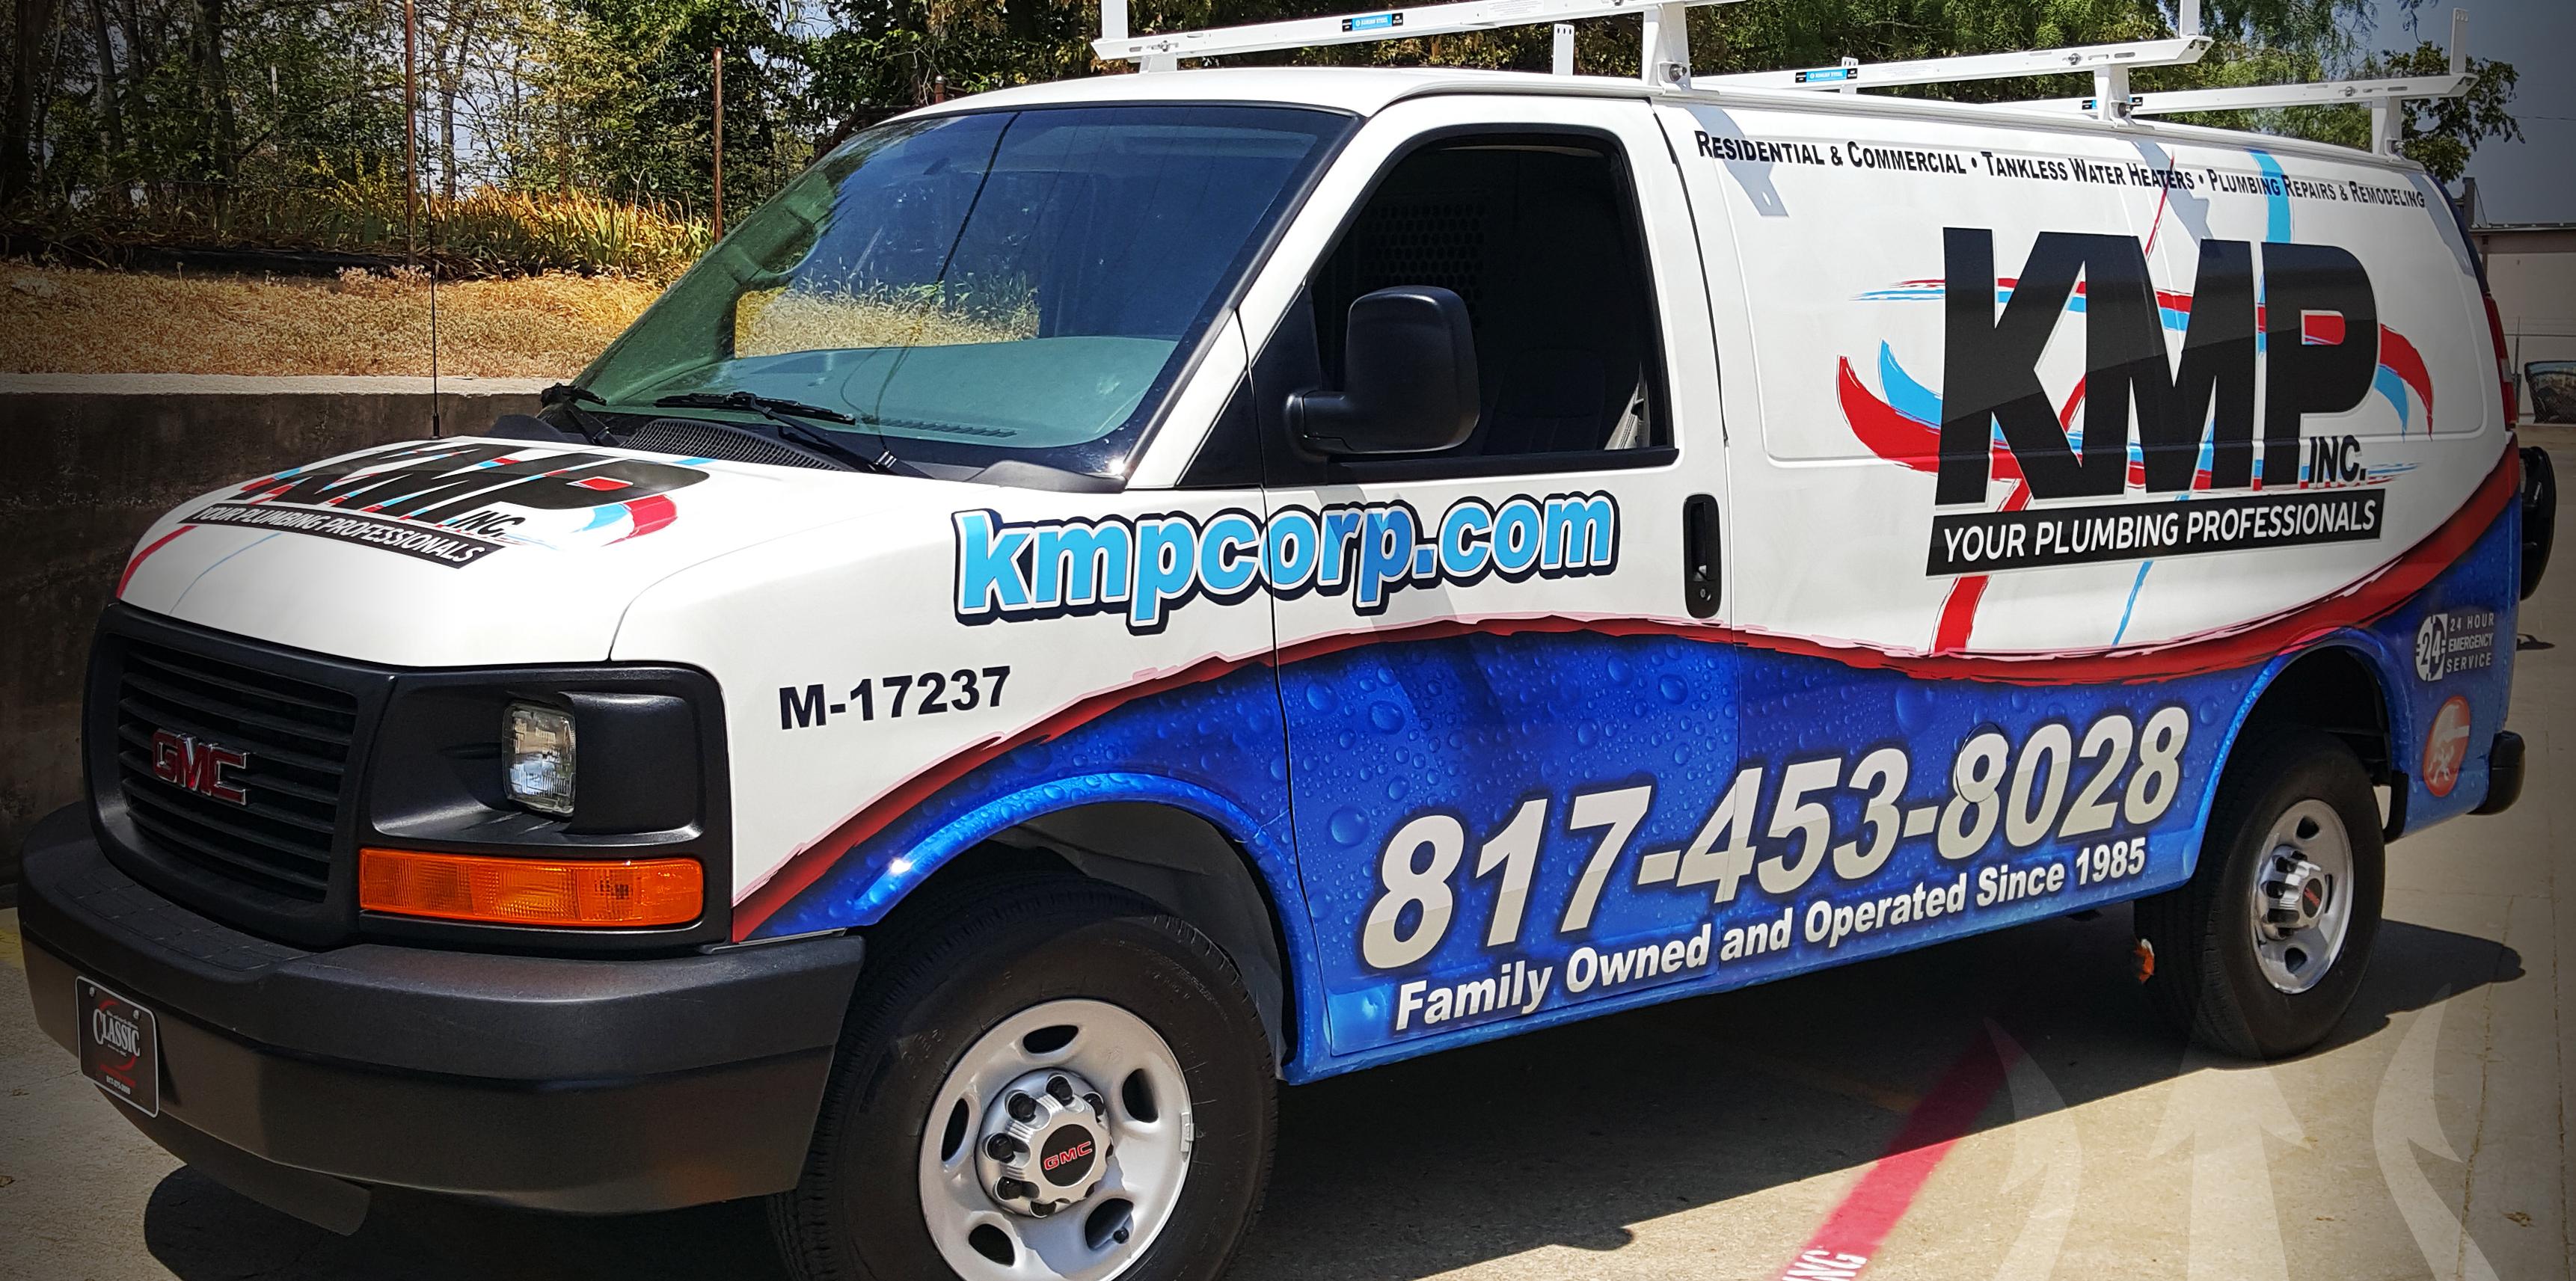 Van Wraps in Dallas TX, DFW, Frisco TX, Plano TX, Carrollton TX